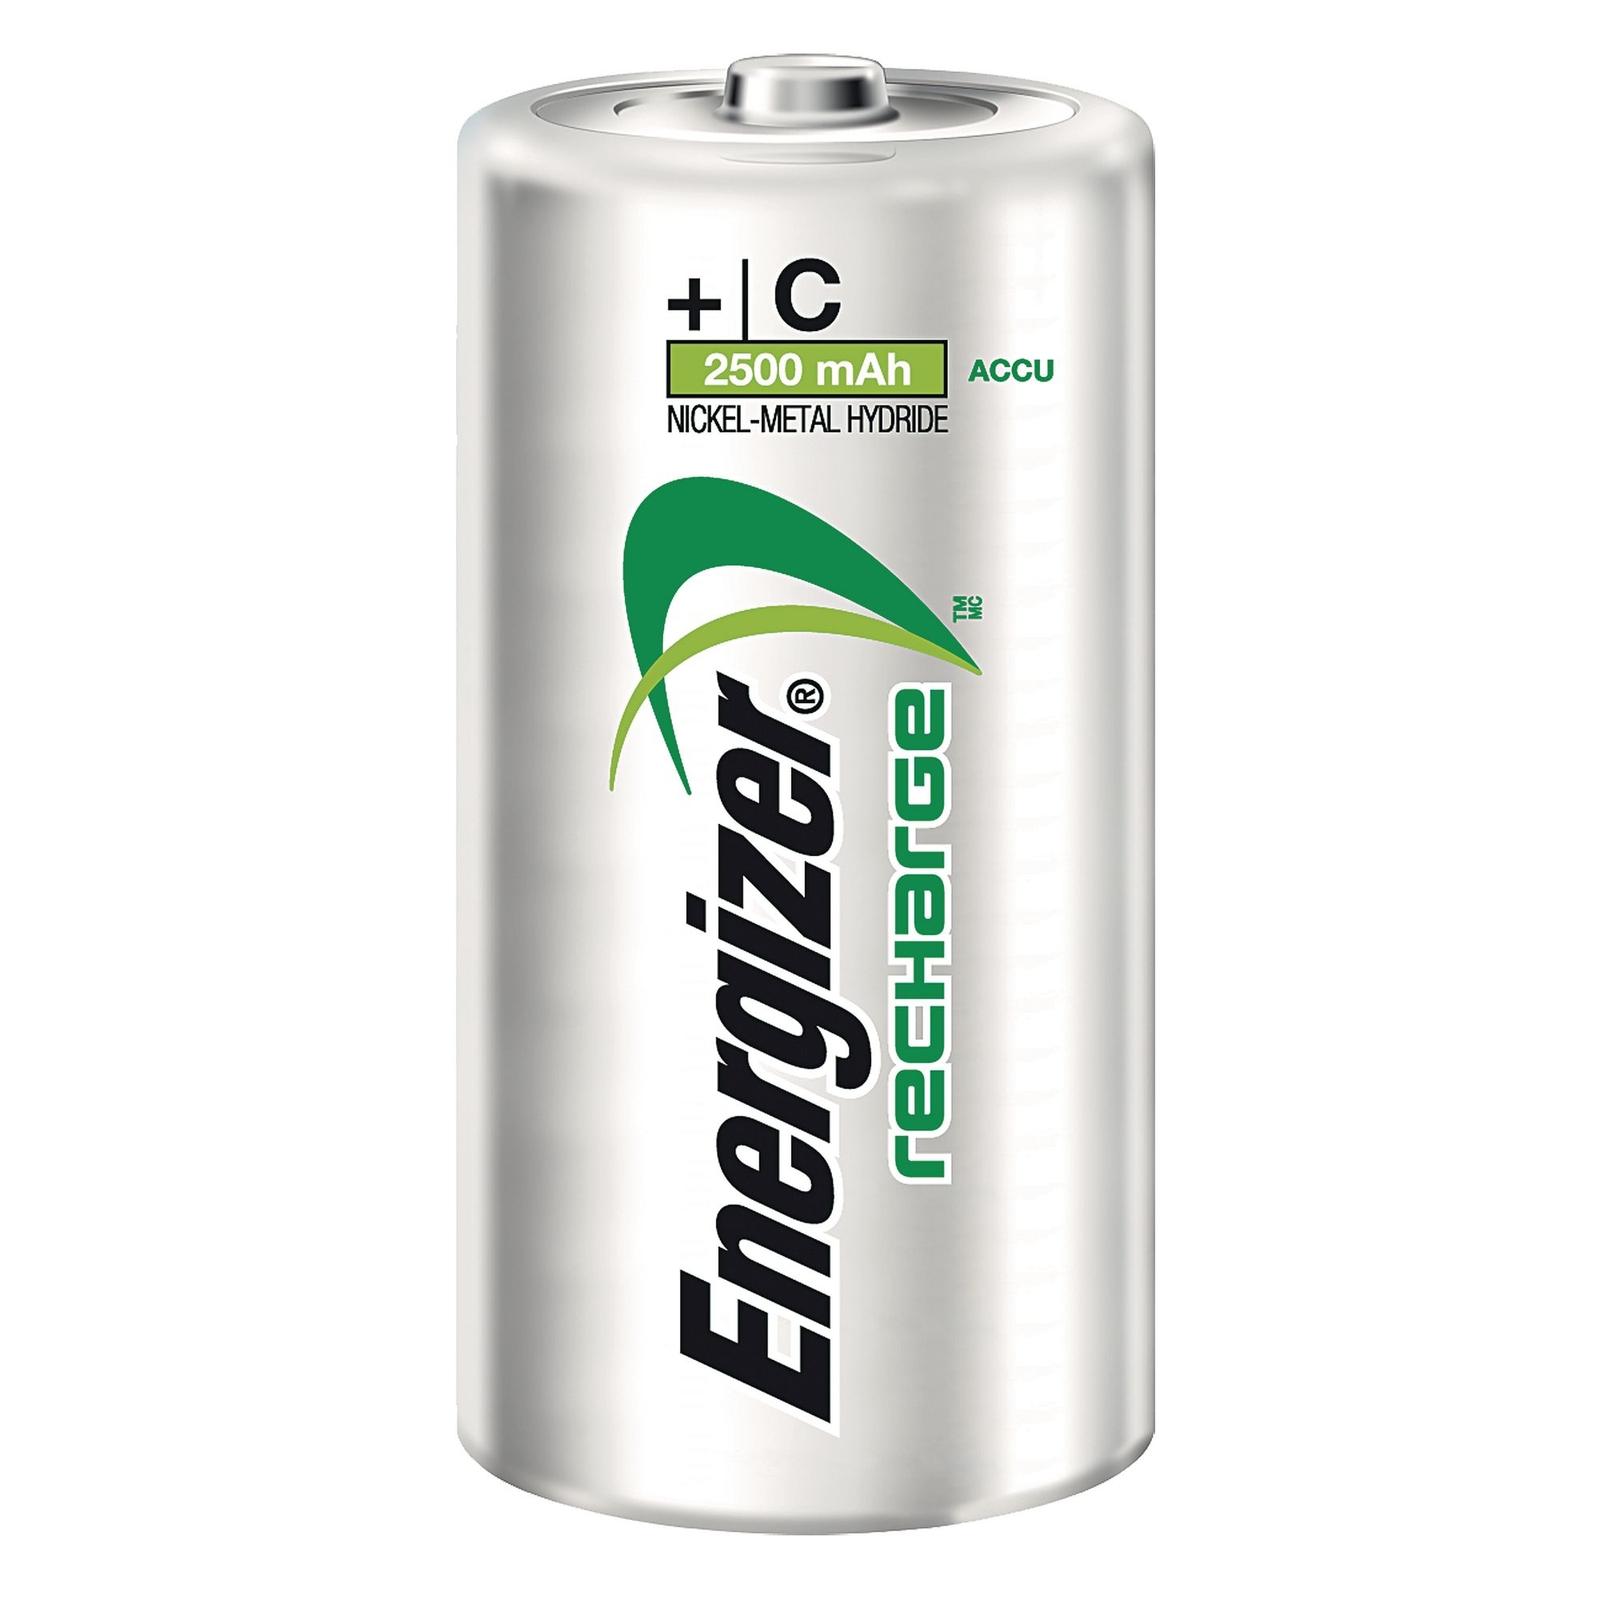 Rechargeable Nickel metal Hydride Battery - C, HR14